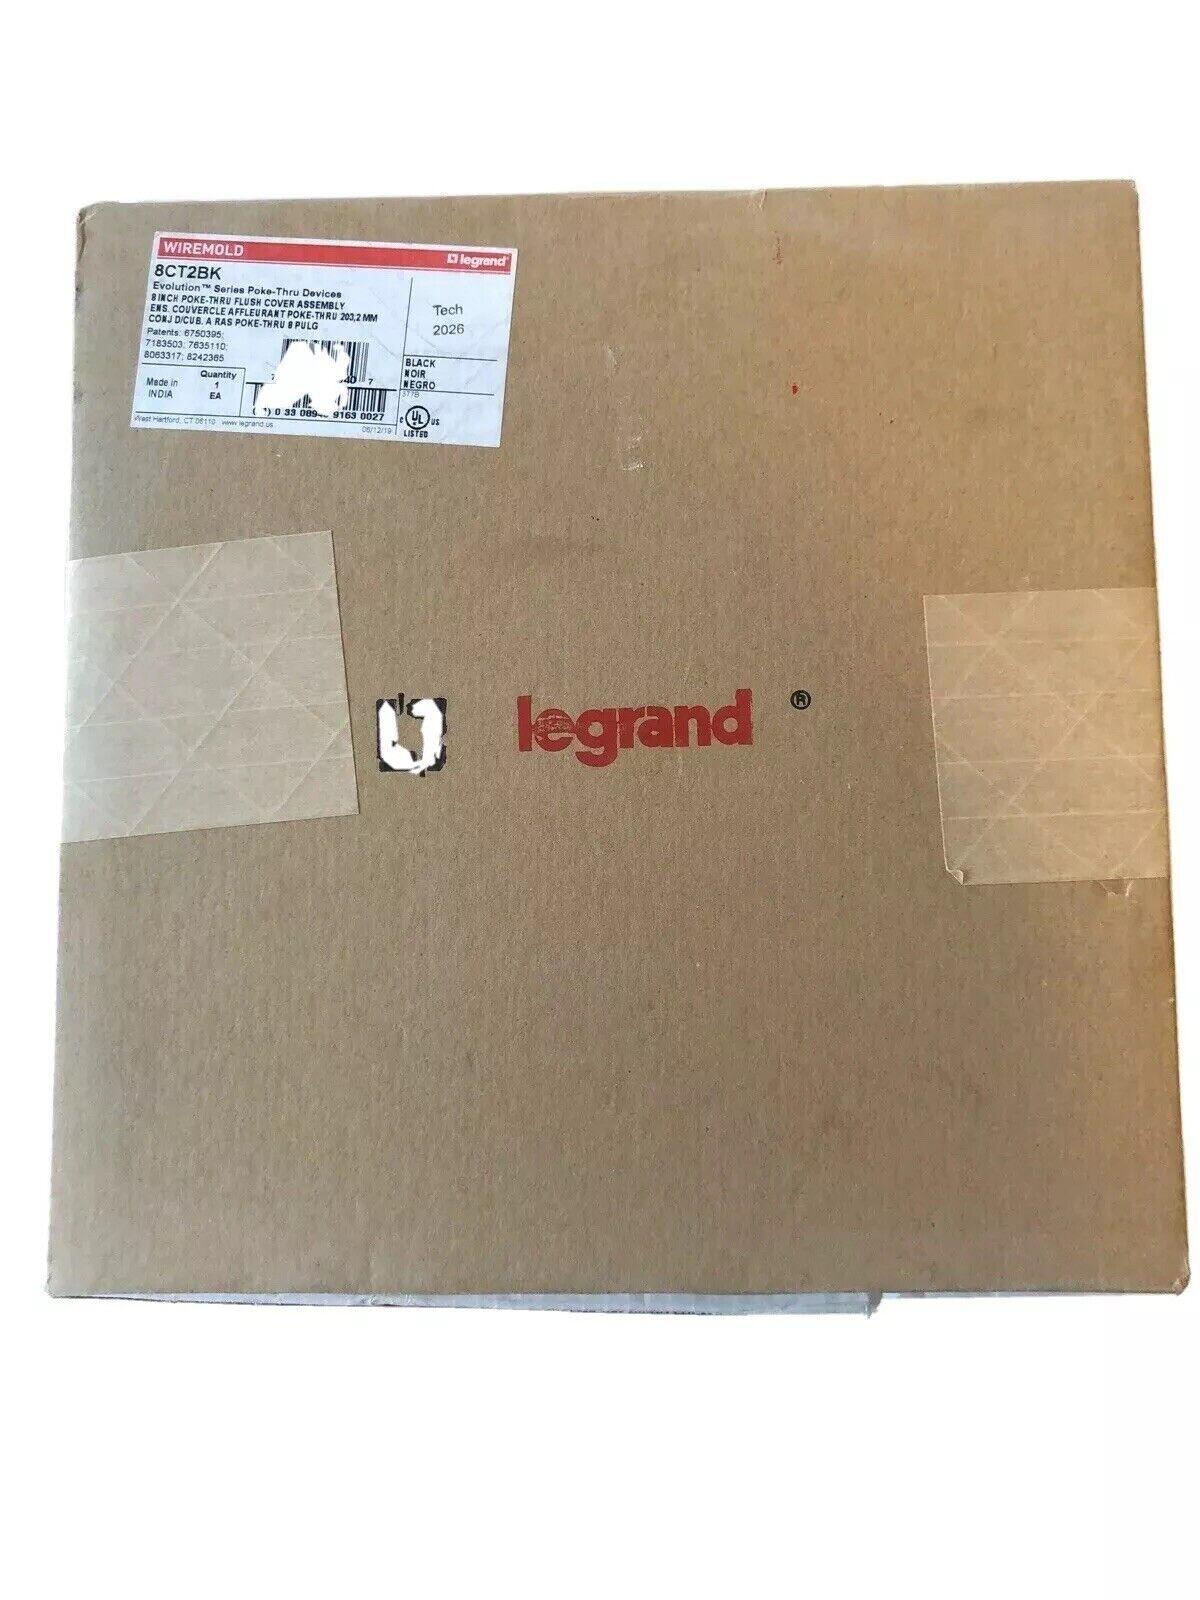 WIREMOLD EFB6S EVOLUTION RECESSED FLOOR BOX 3-GANG STEEL LEGRAND NIB